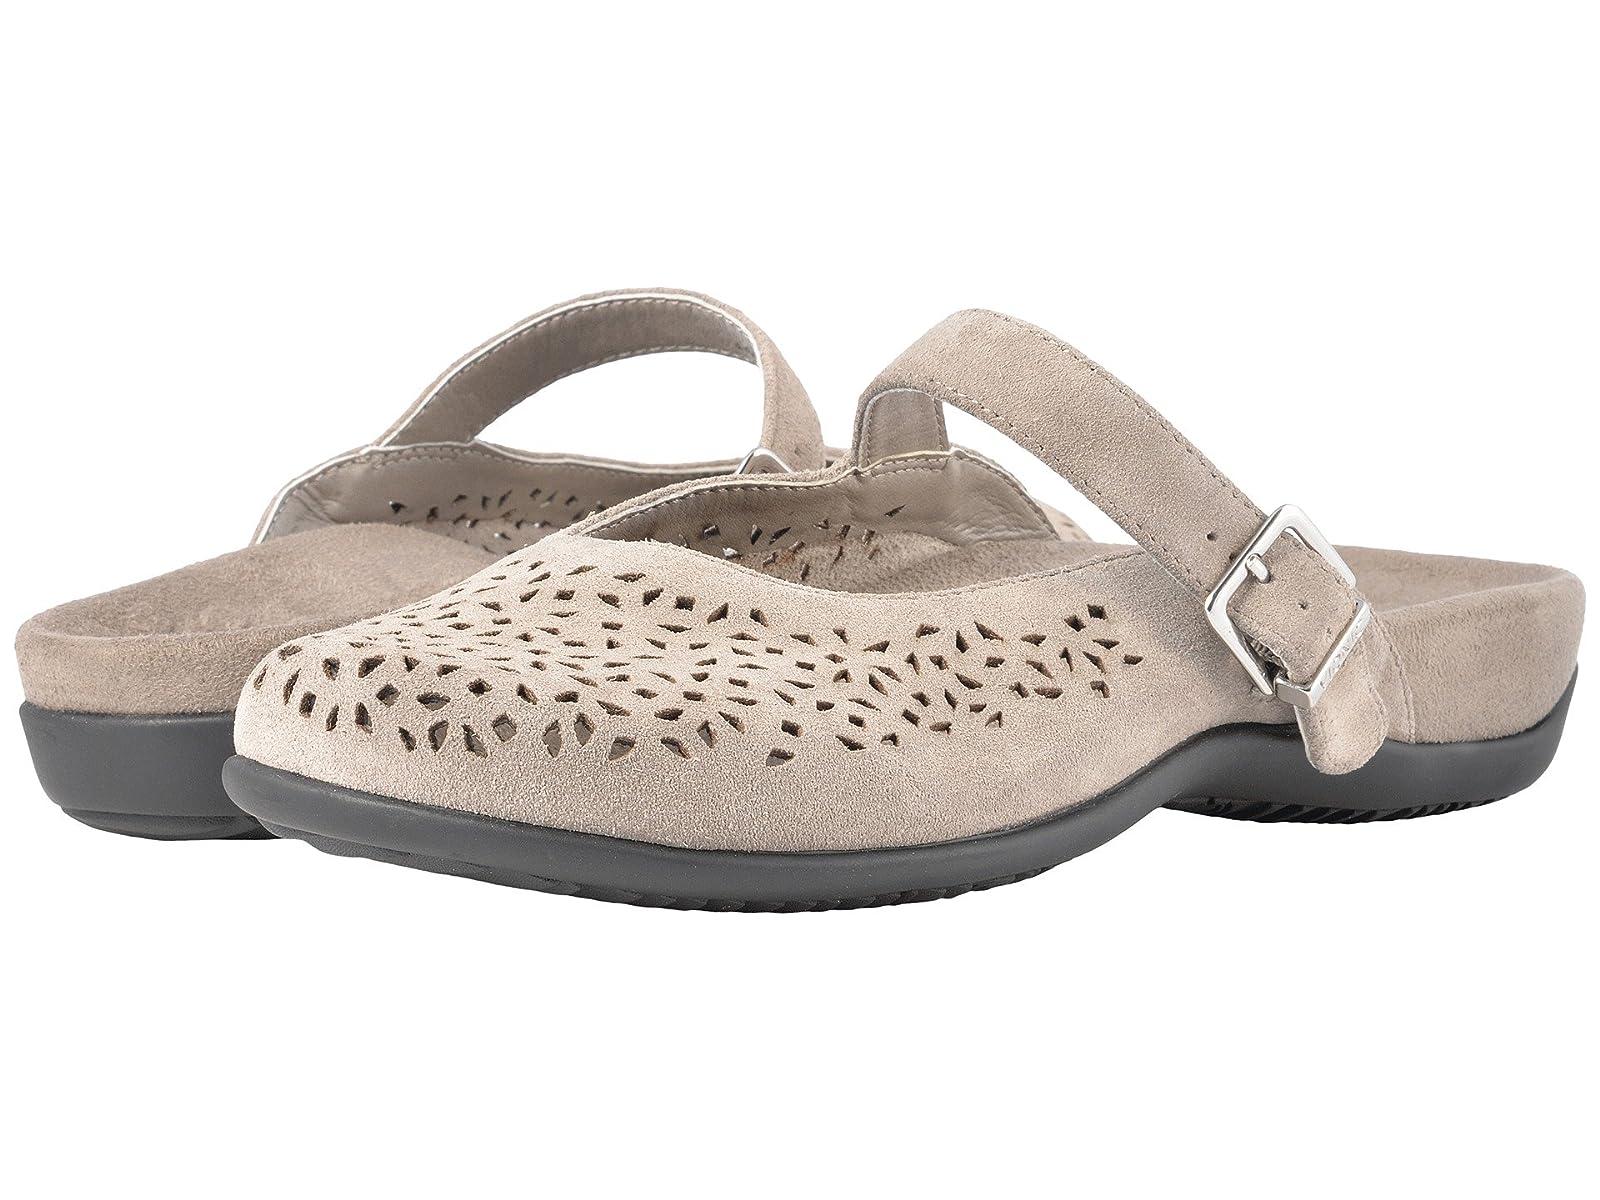 VIONIC LidiaAtmospheric grades have affordable shoes